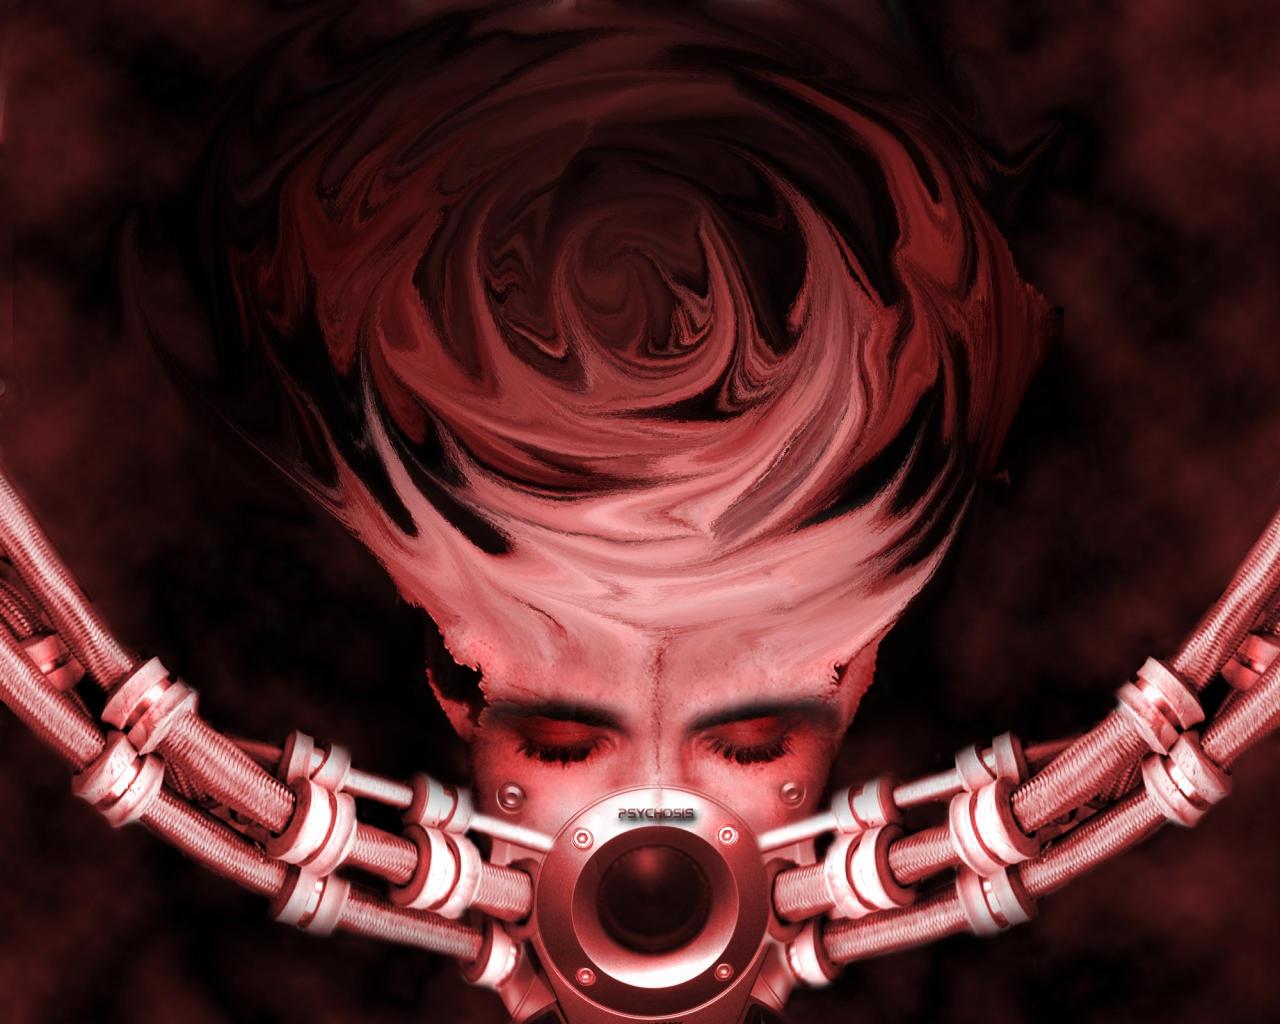 Psychosis v.2 by MistaBobby